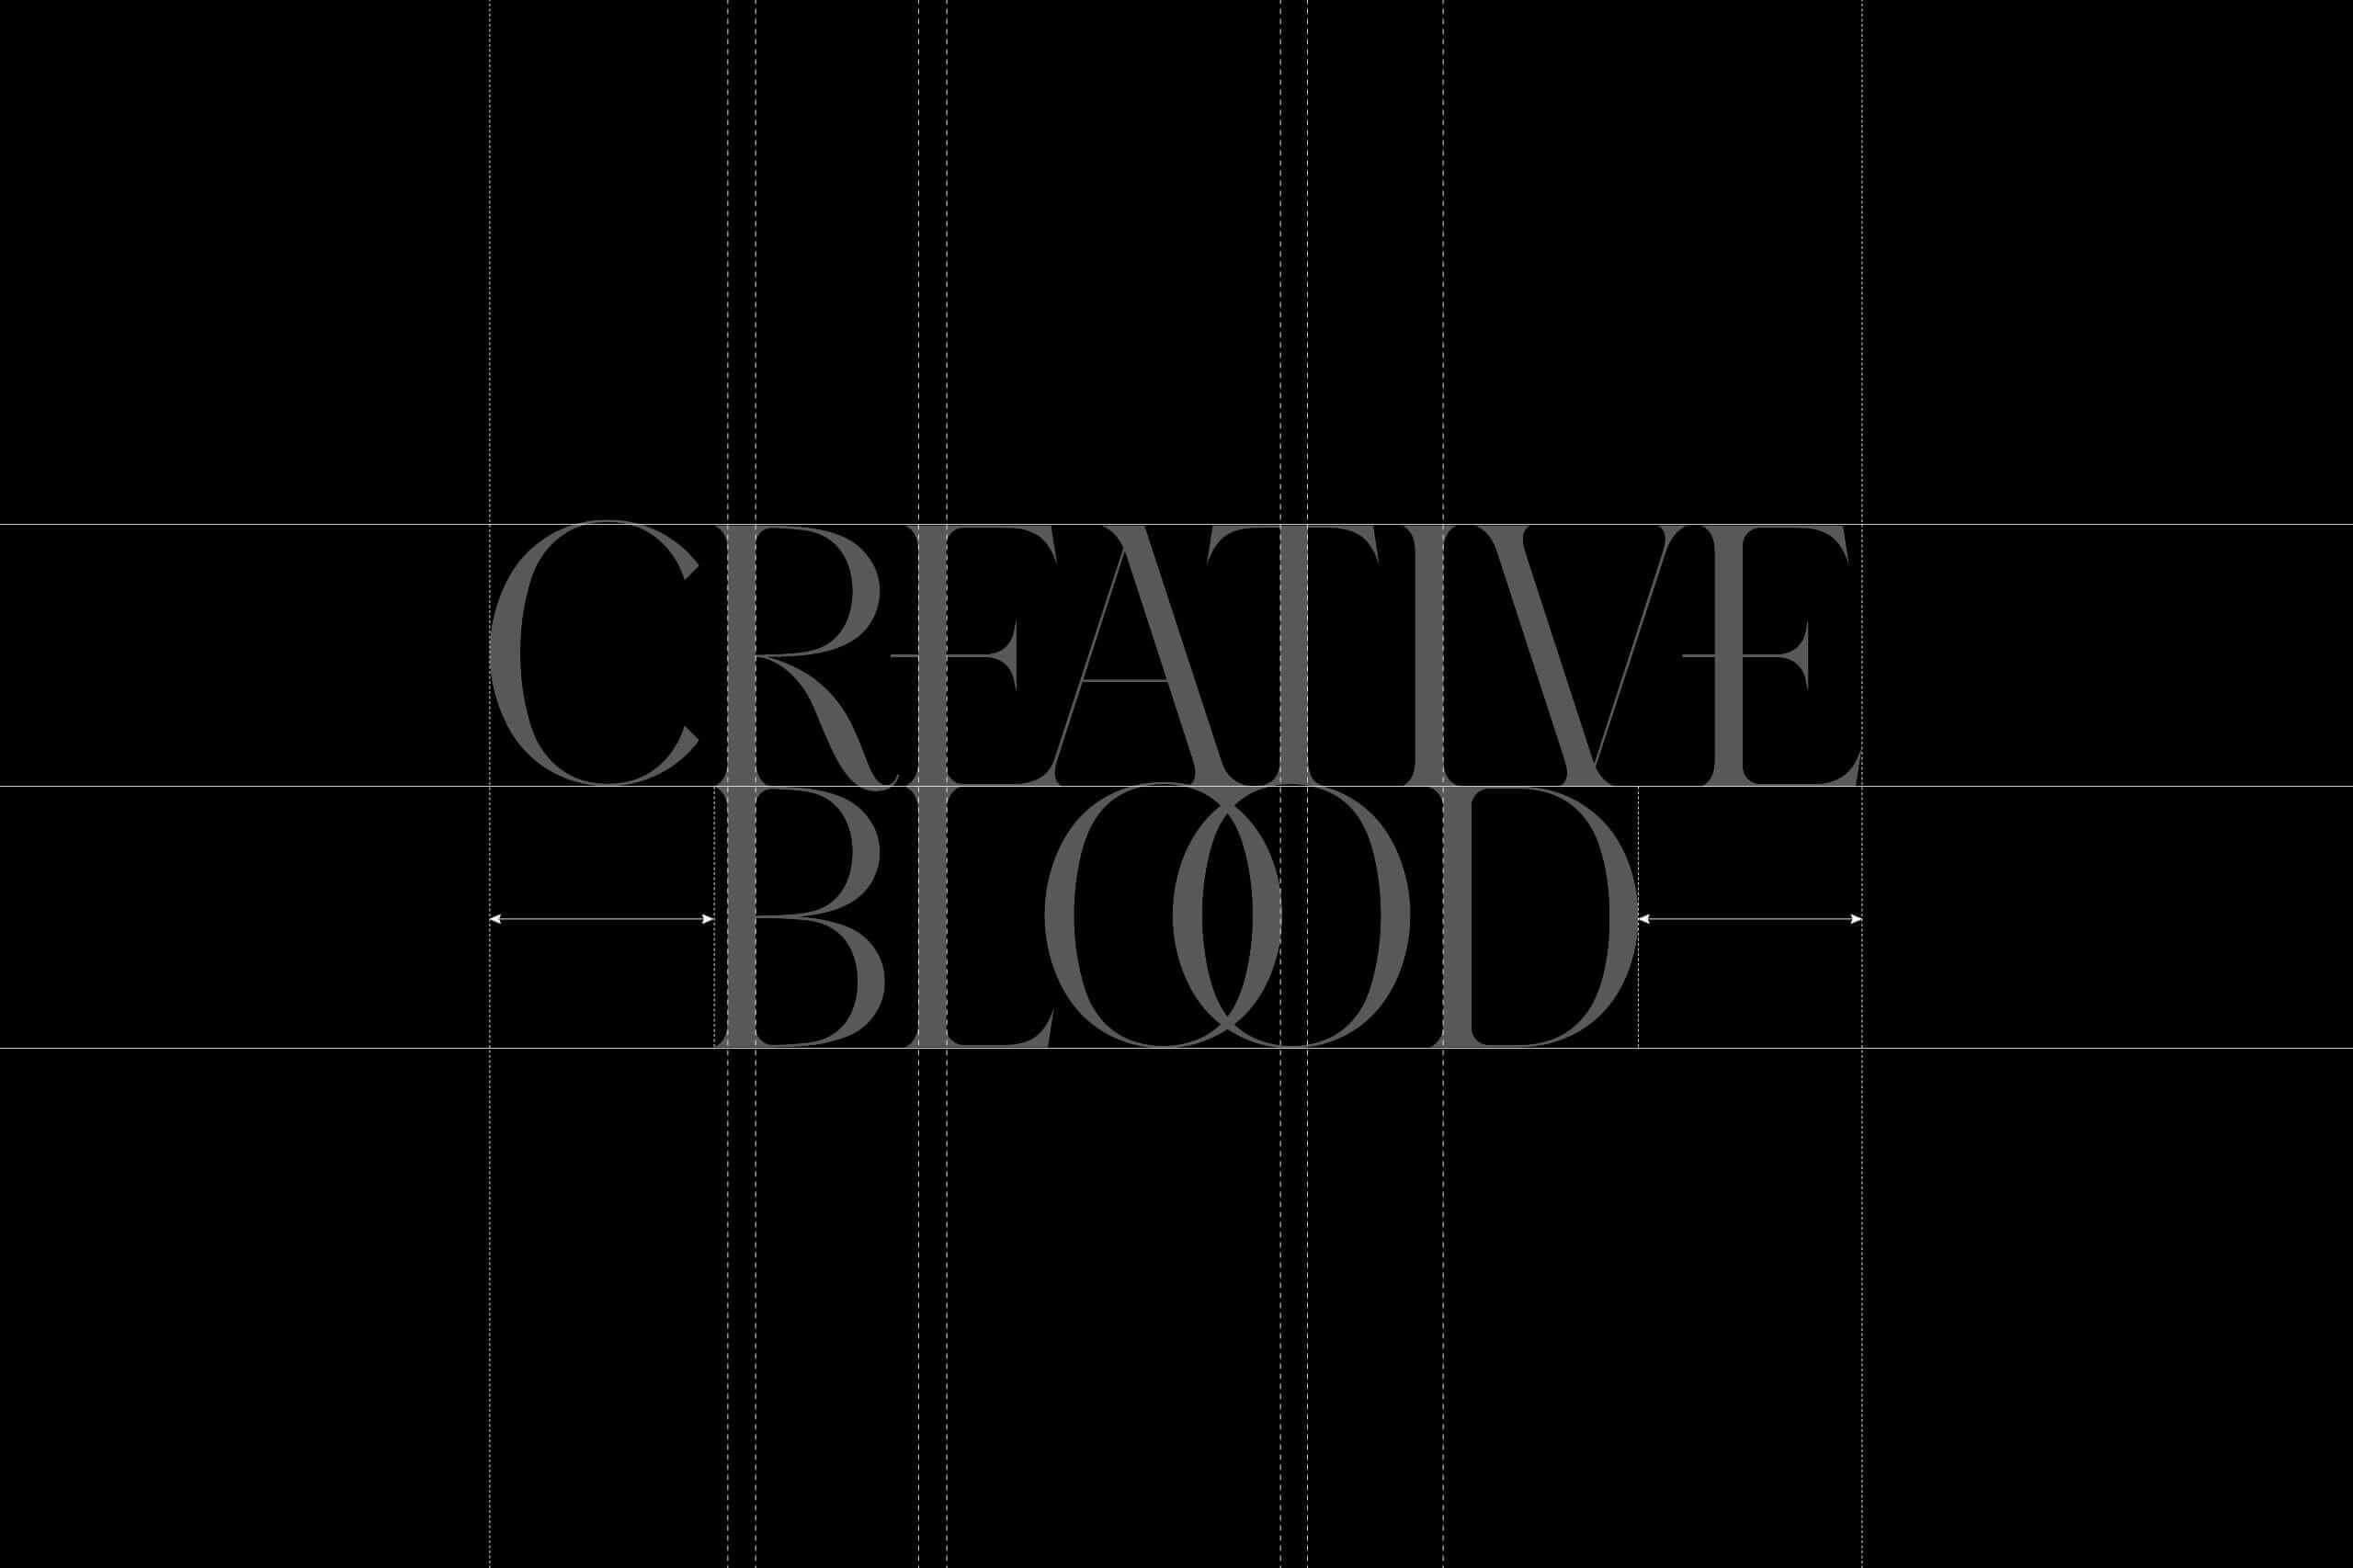 AI_Creative-Blood_LR_6-compressor